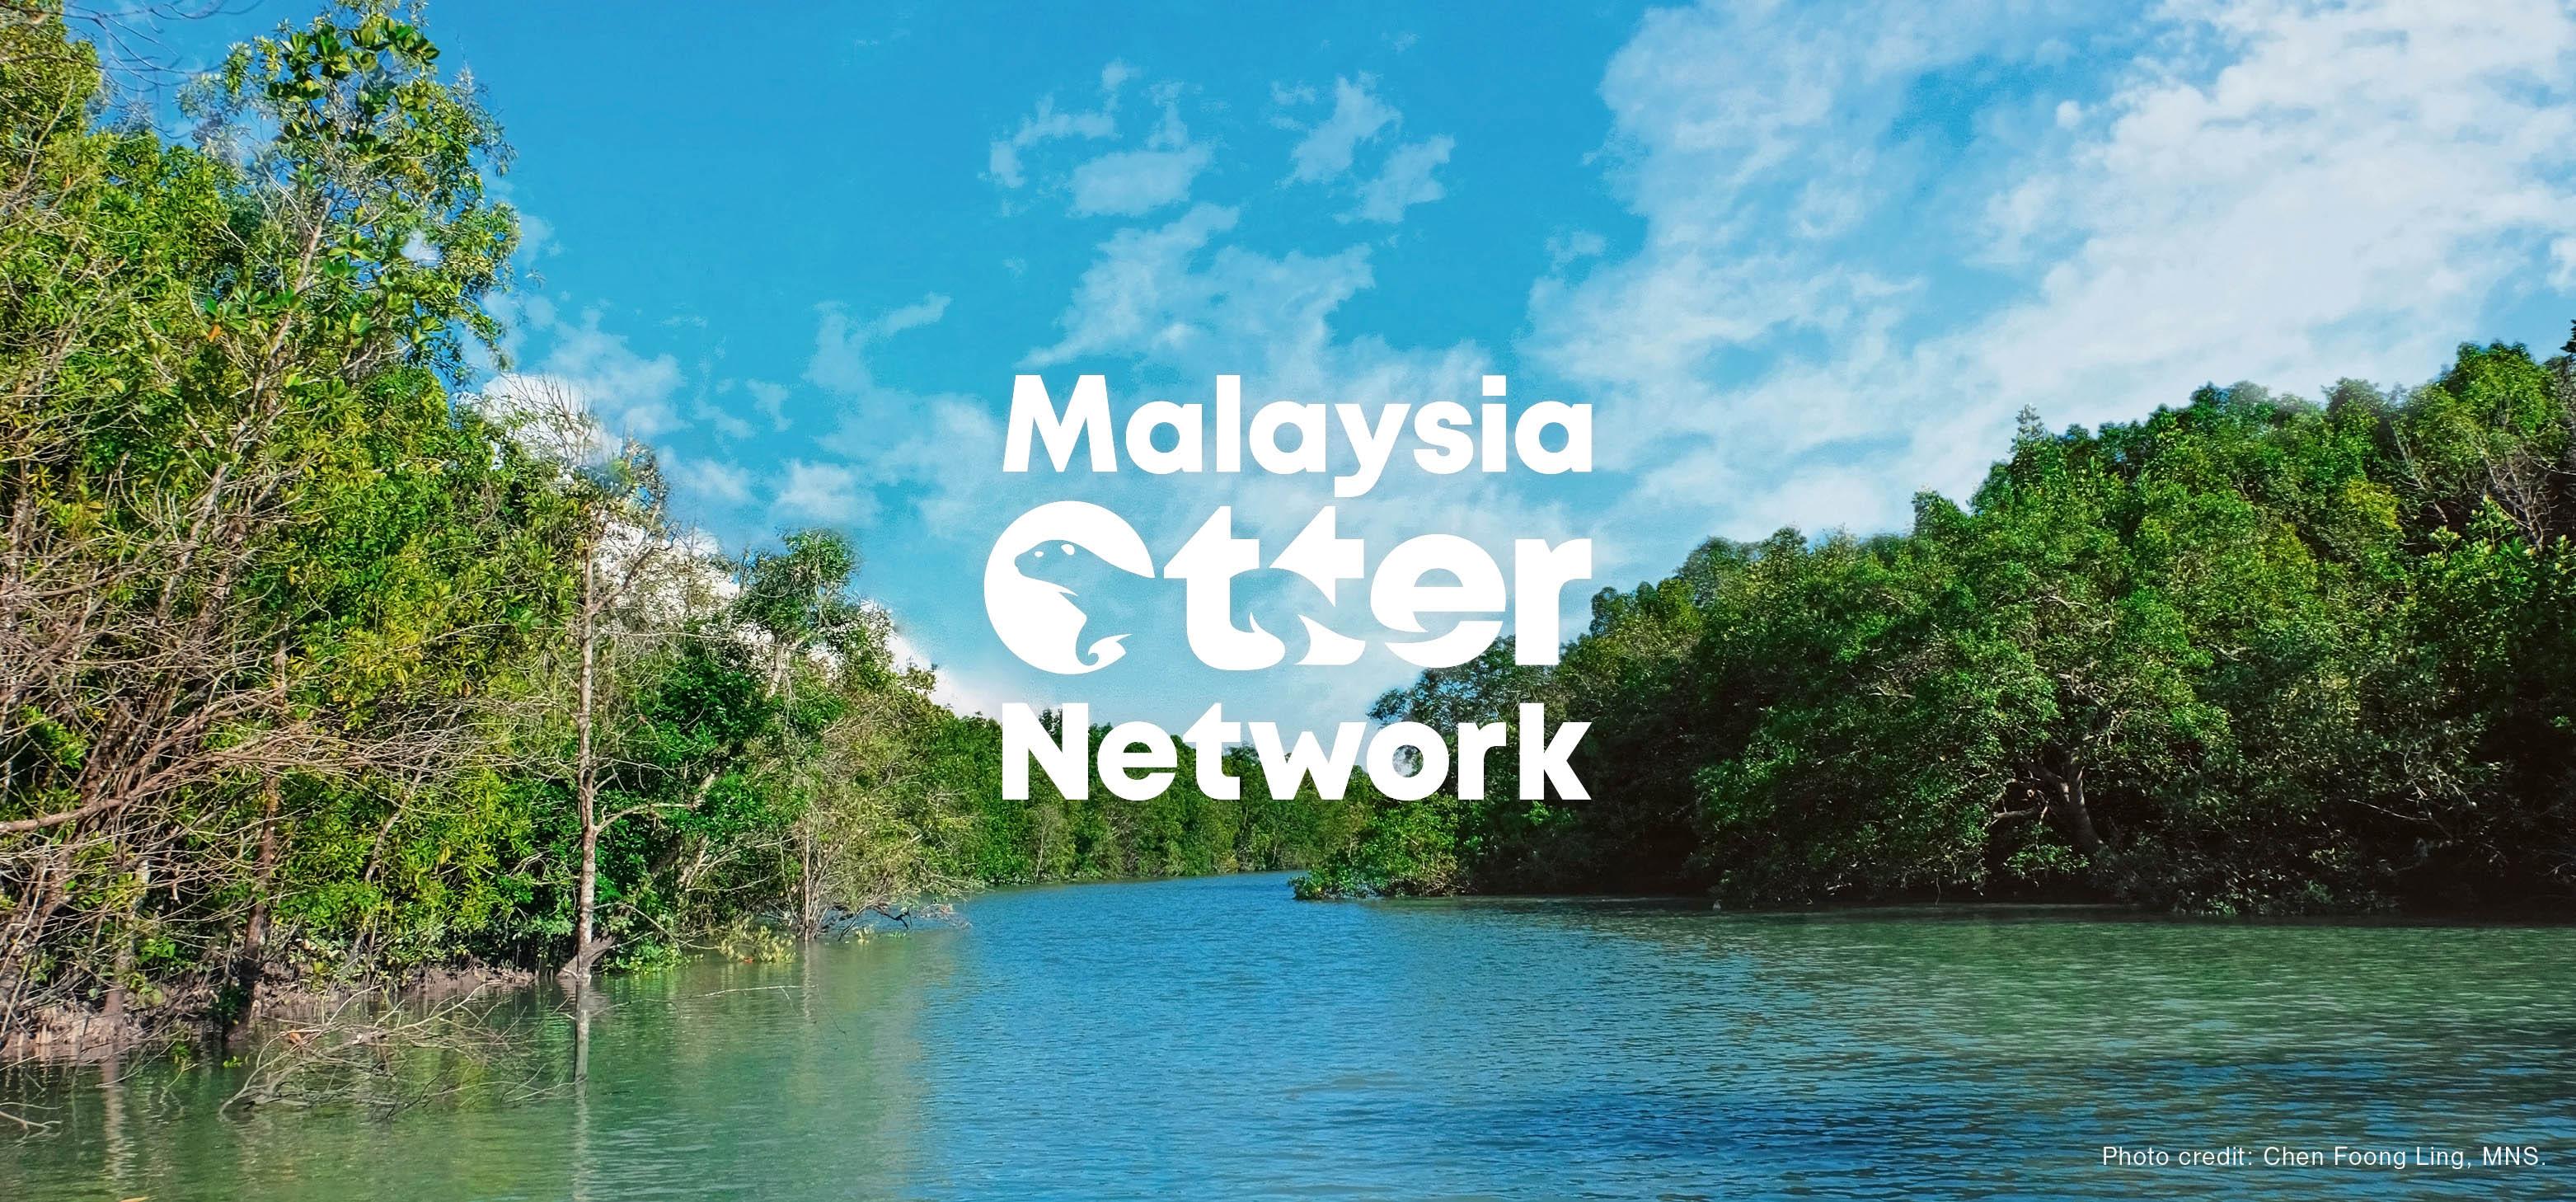 Epikinono Studio Creates Malaysia Otter Network (MON) Brand Identity Design